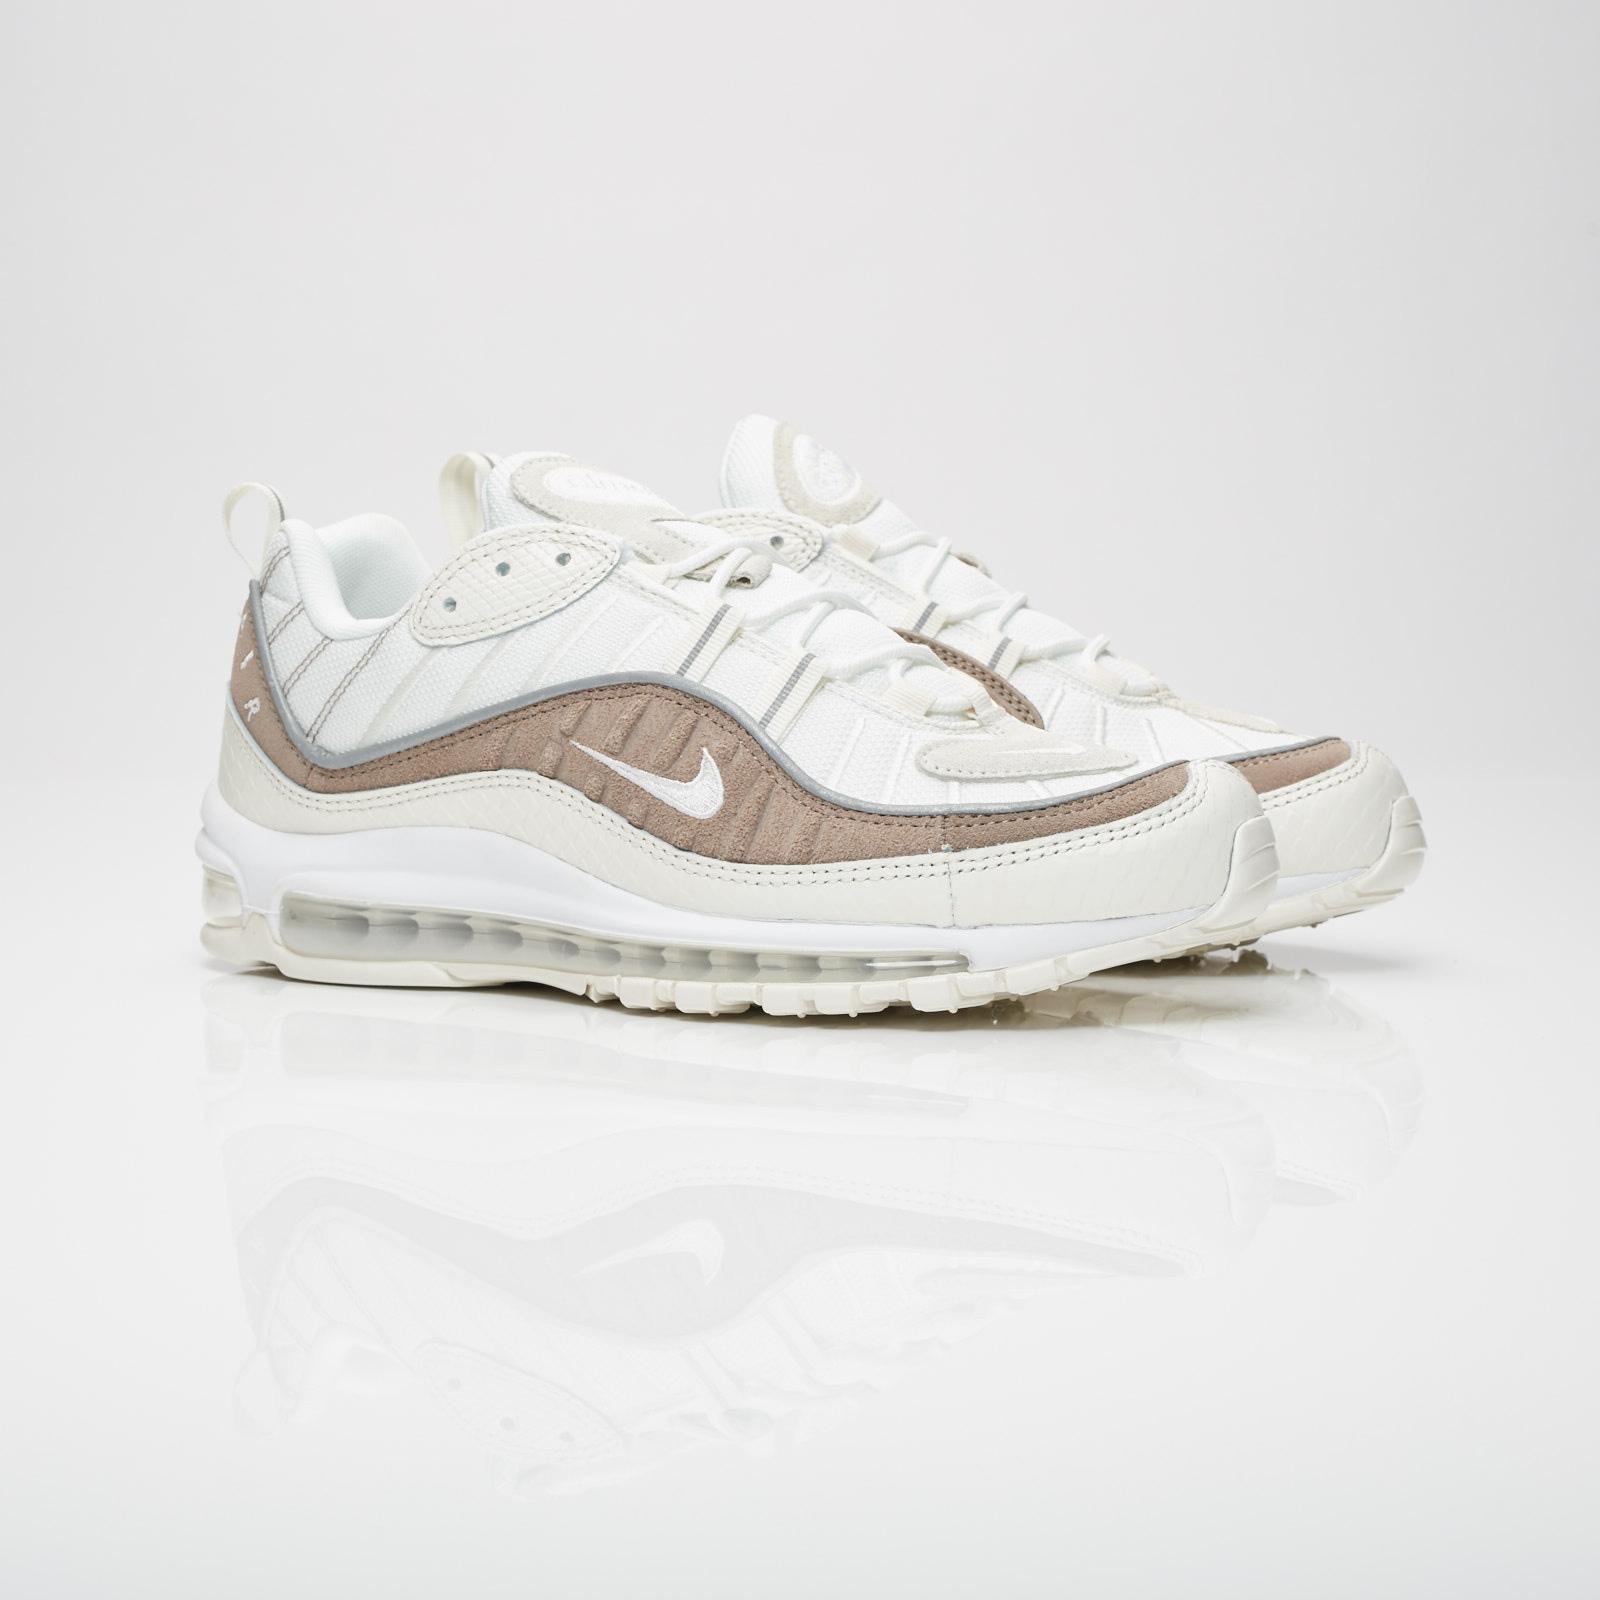 quality design d8437 1f0a3 Nike Sportswear Air Max 98 SE